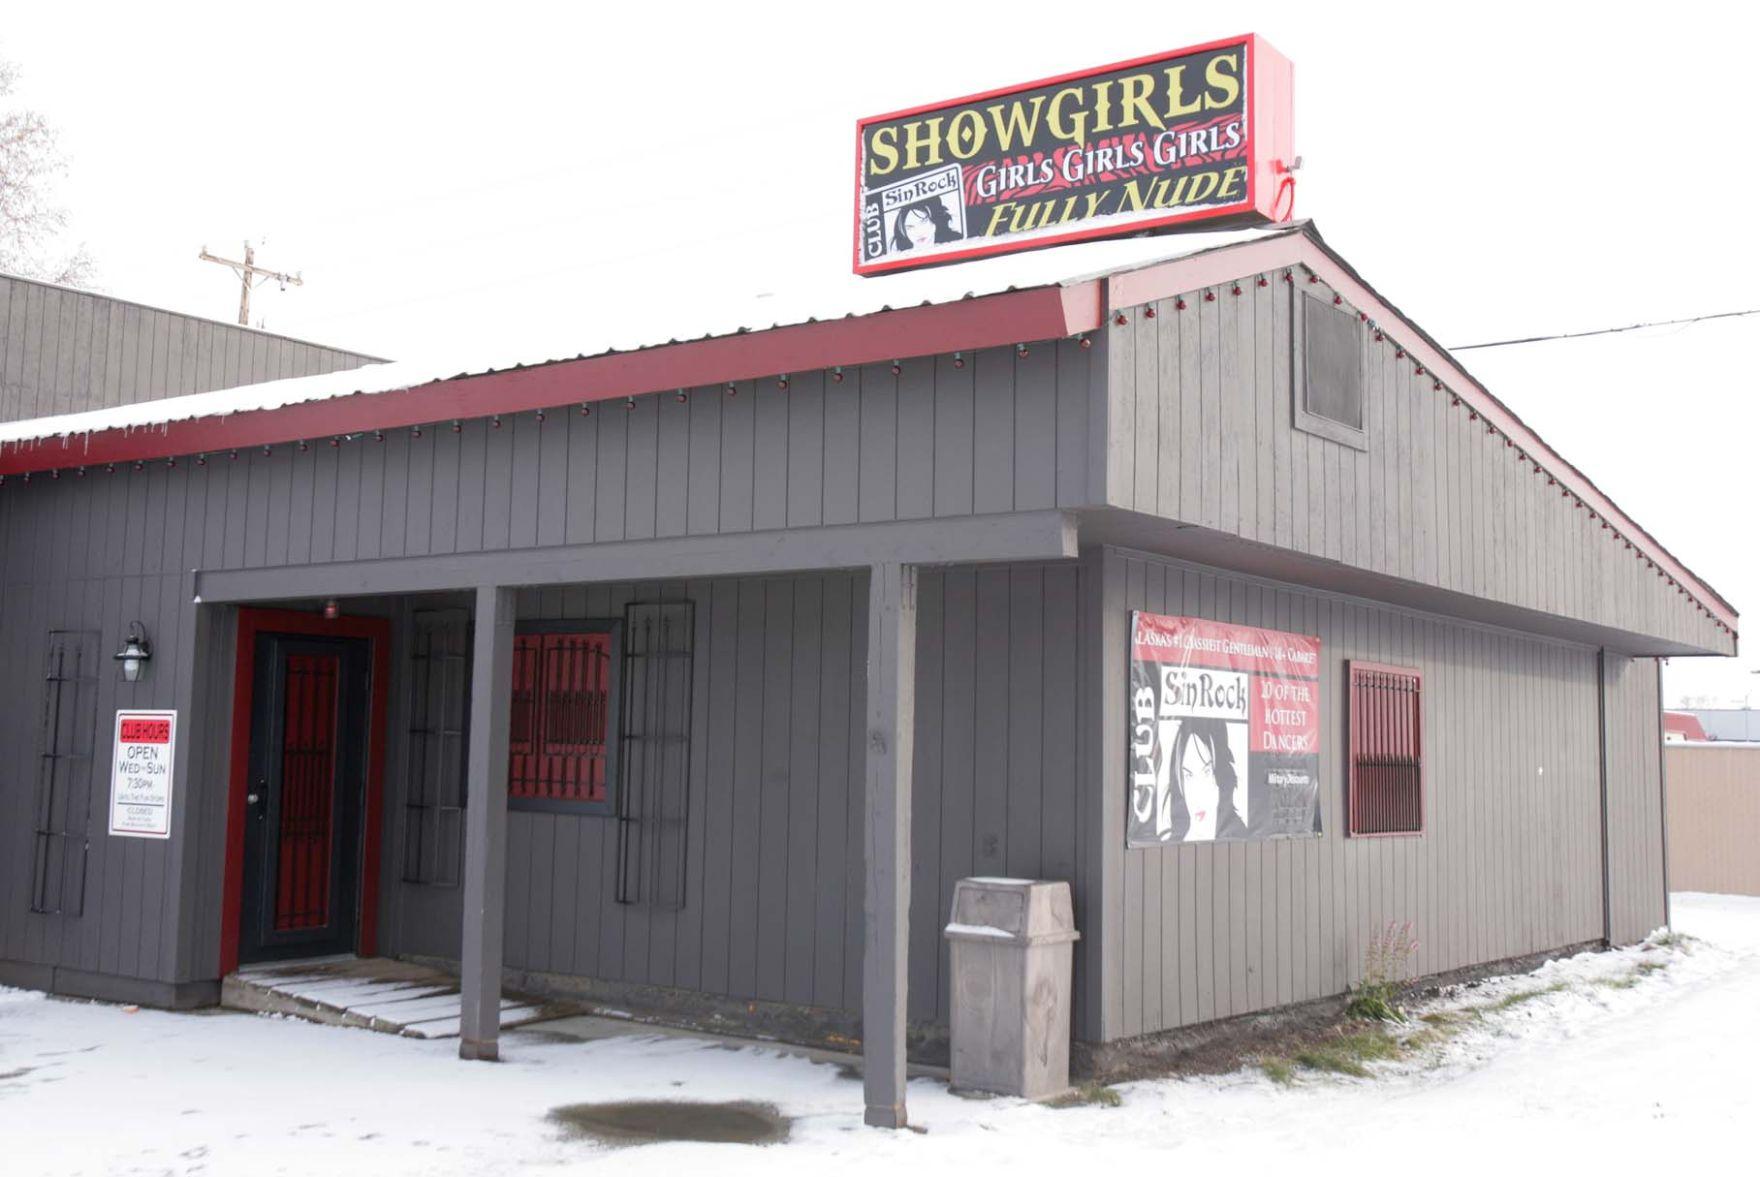 Club nude fairbanks strip